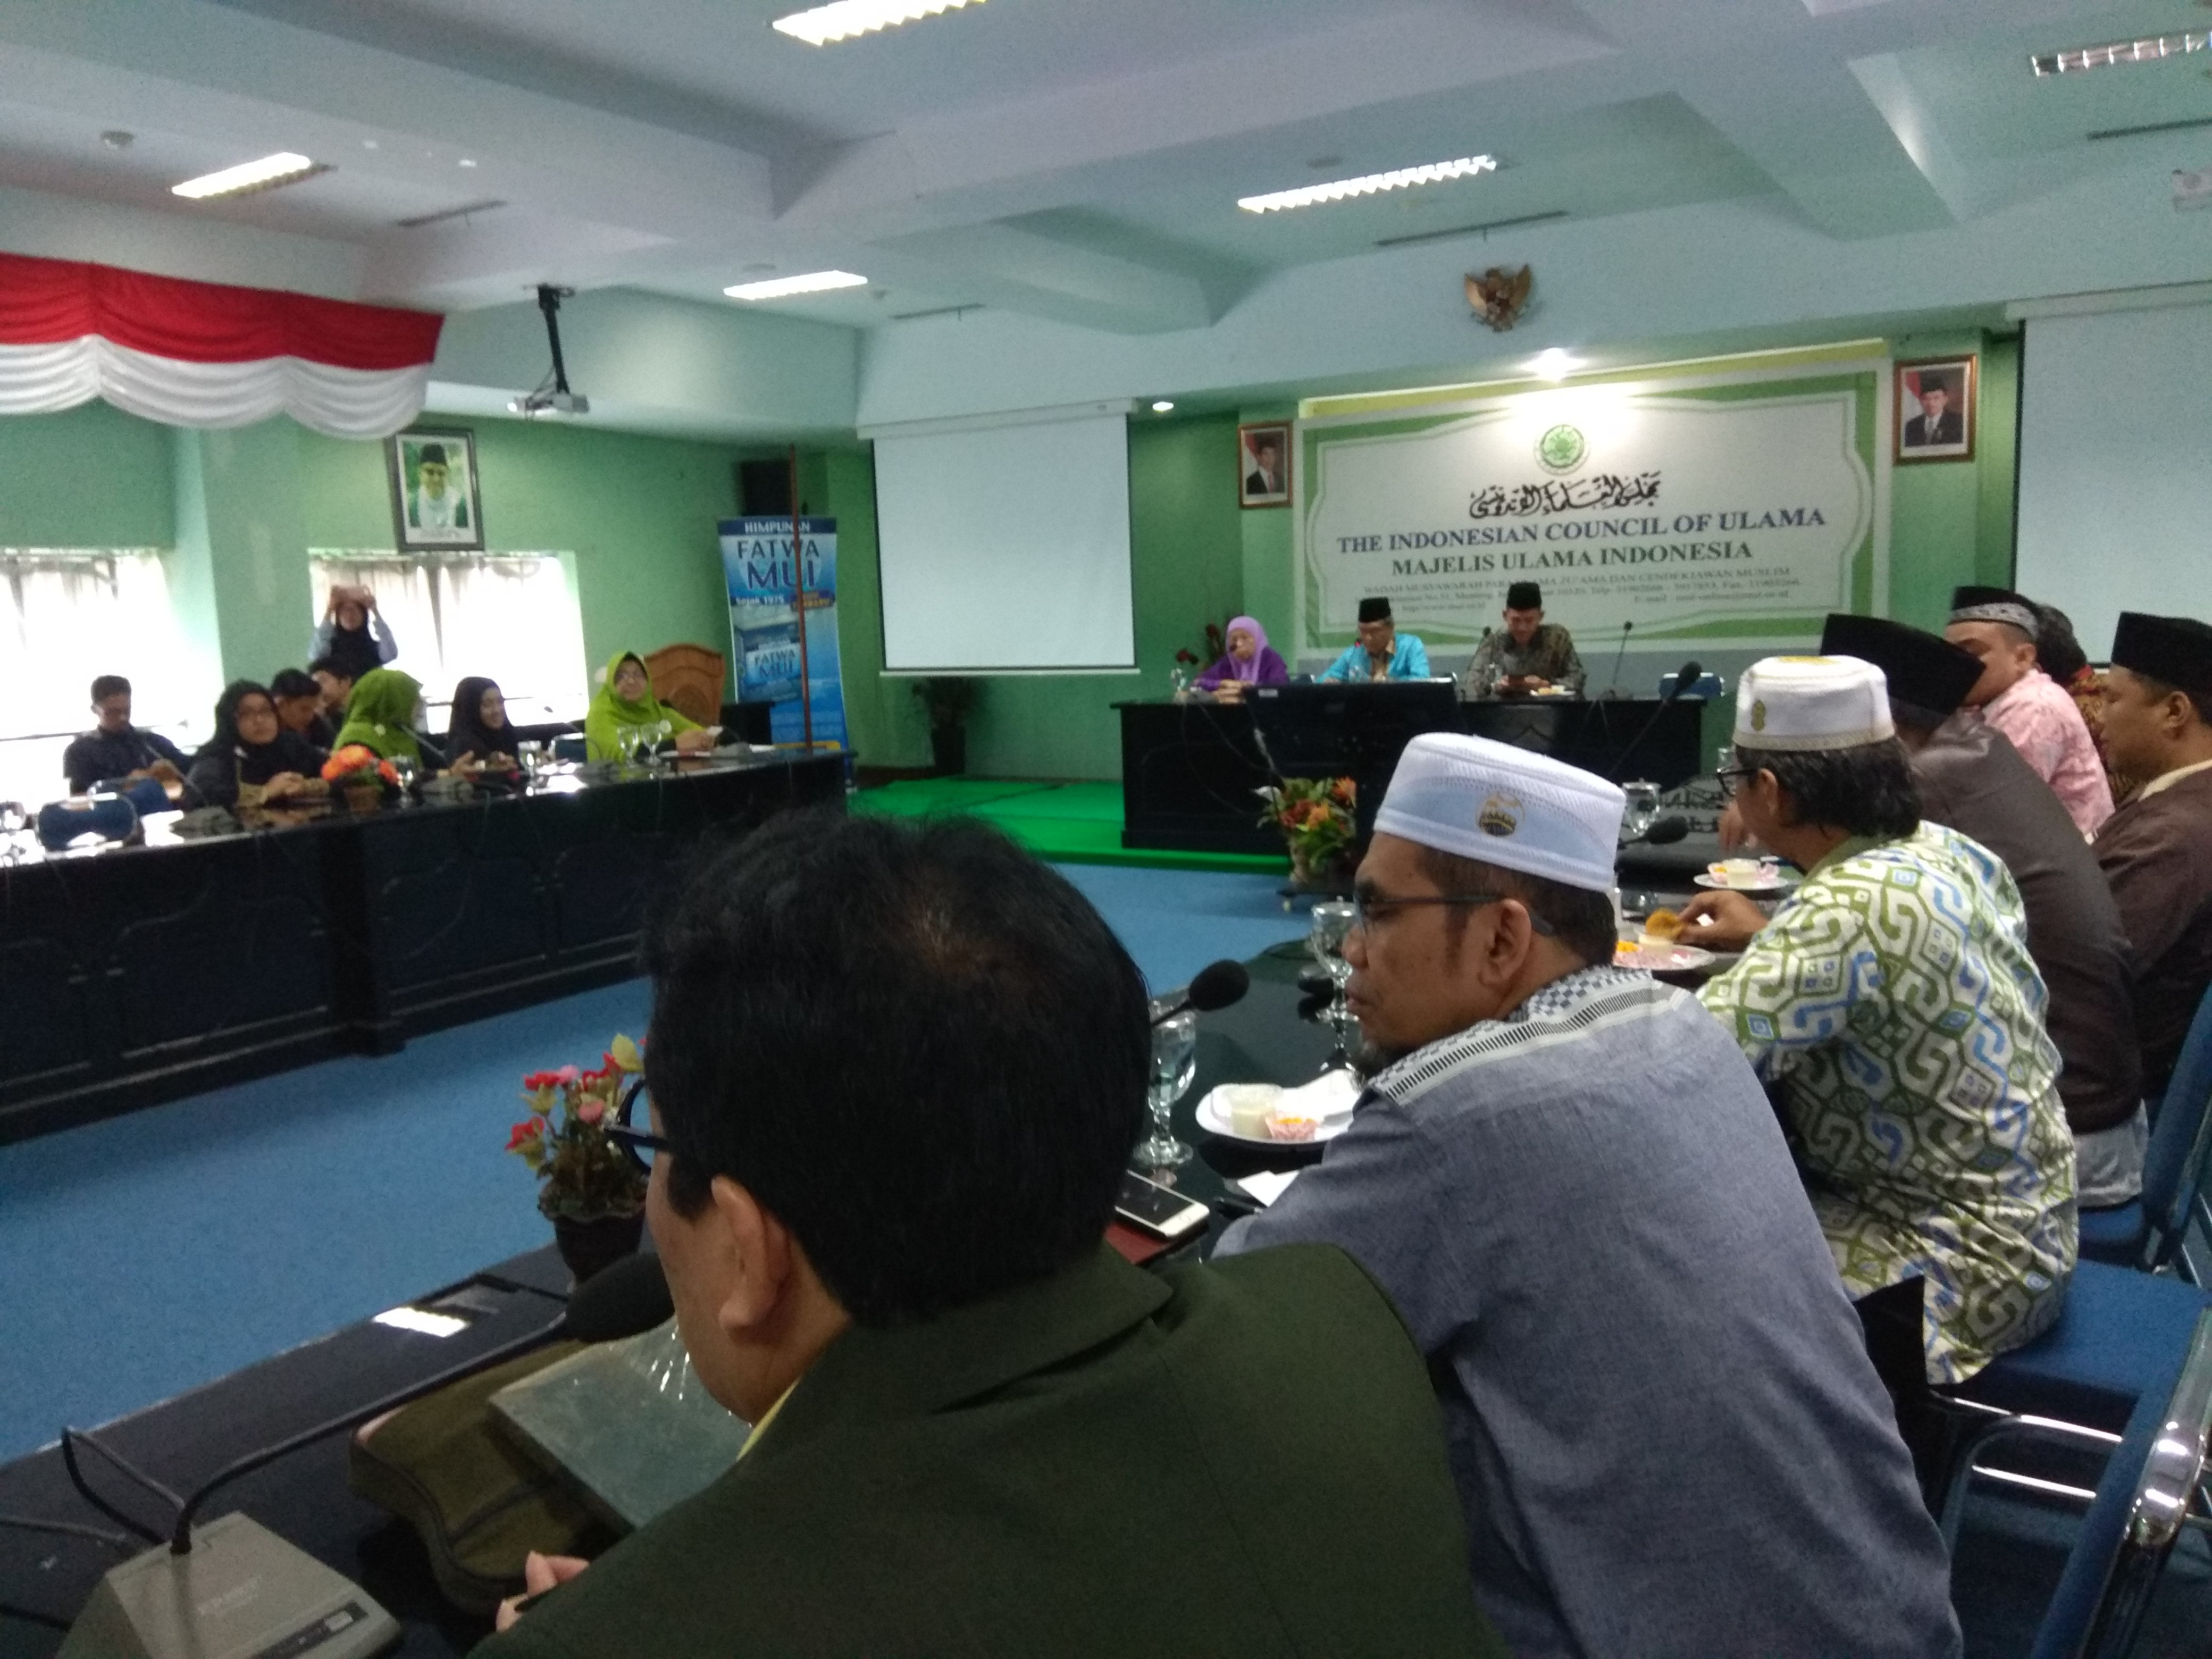 Komisi Fatwa MUI Bahas Fatwa Penanganan Korban Covid-19